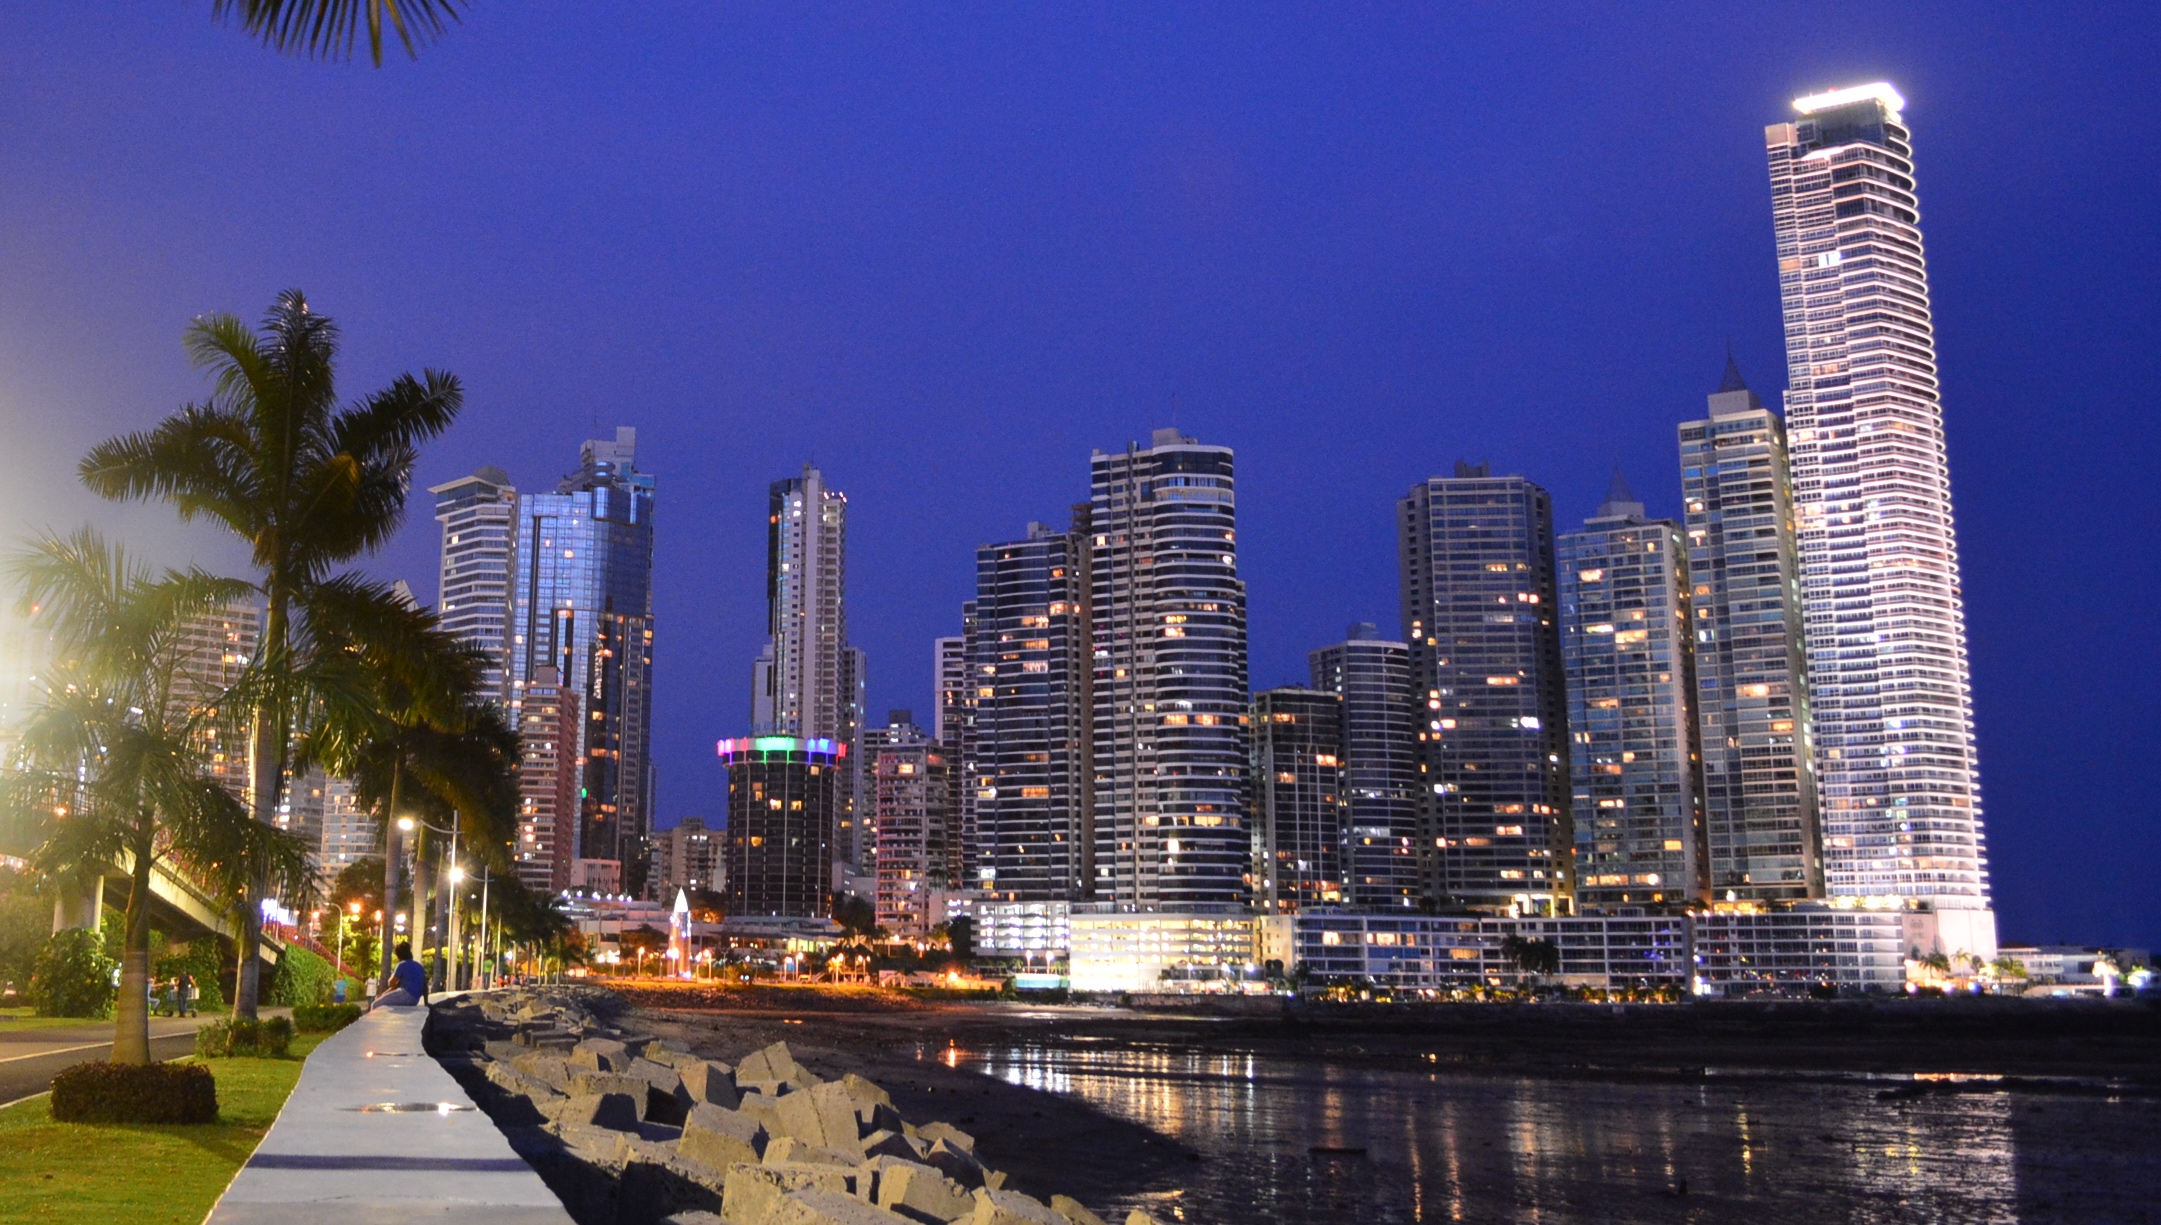 Panamá, el hub del chavismo